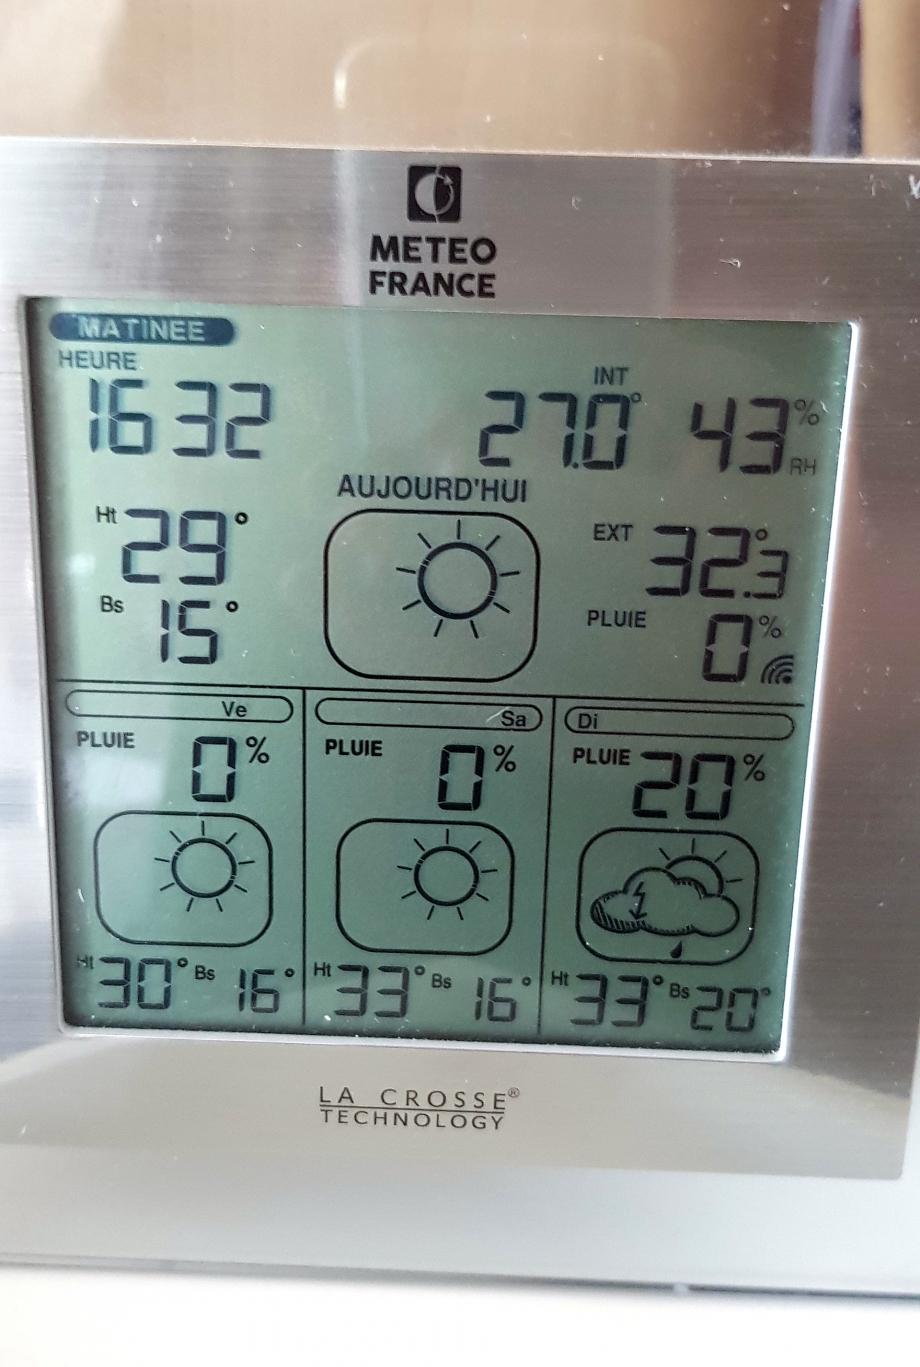 Ecart température int_ext avec bambous 28 juin 18.jpg